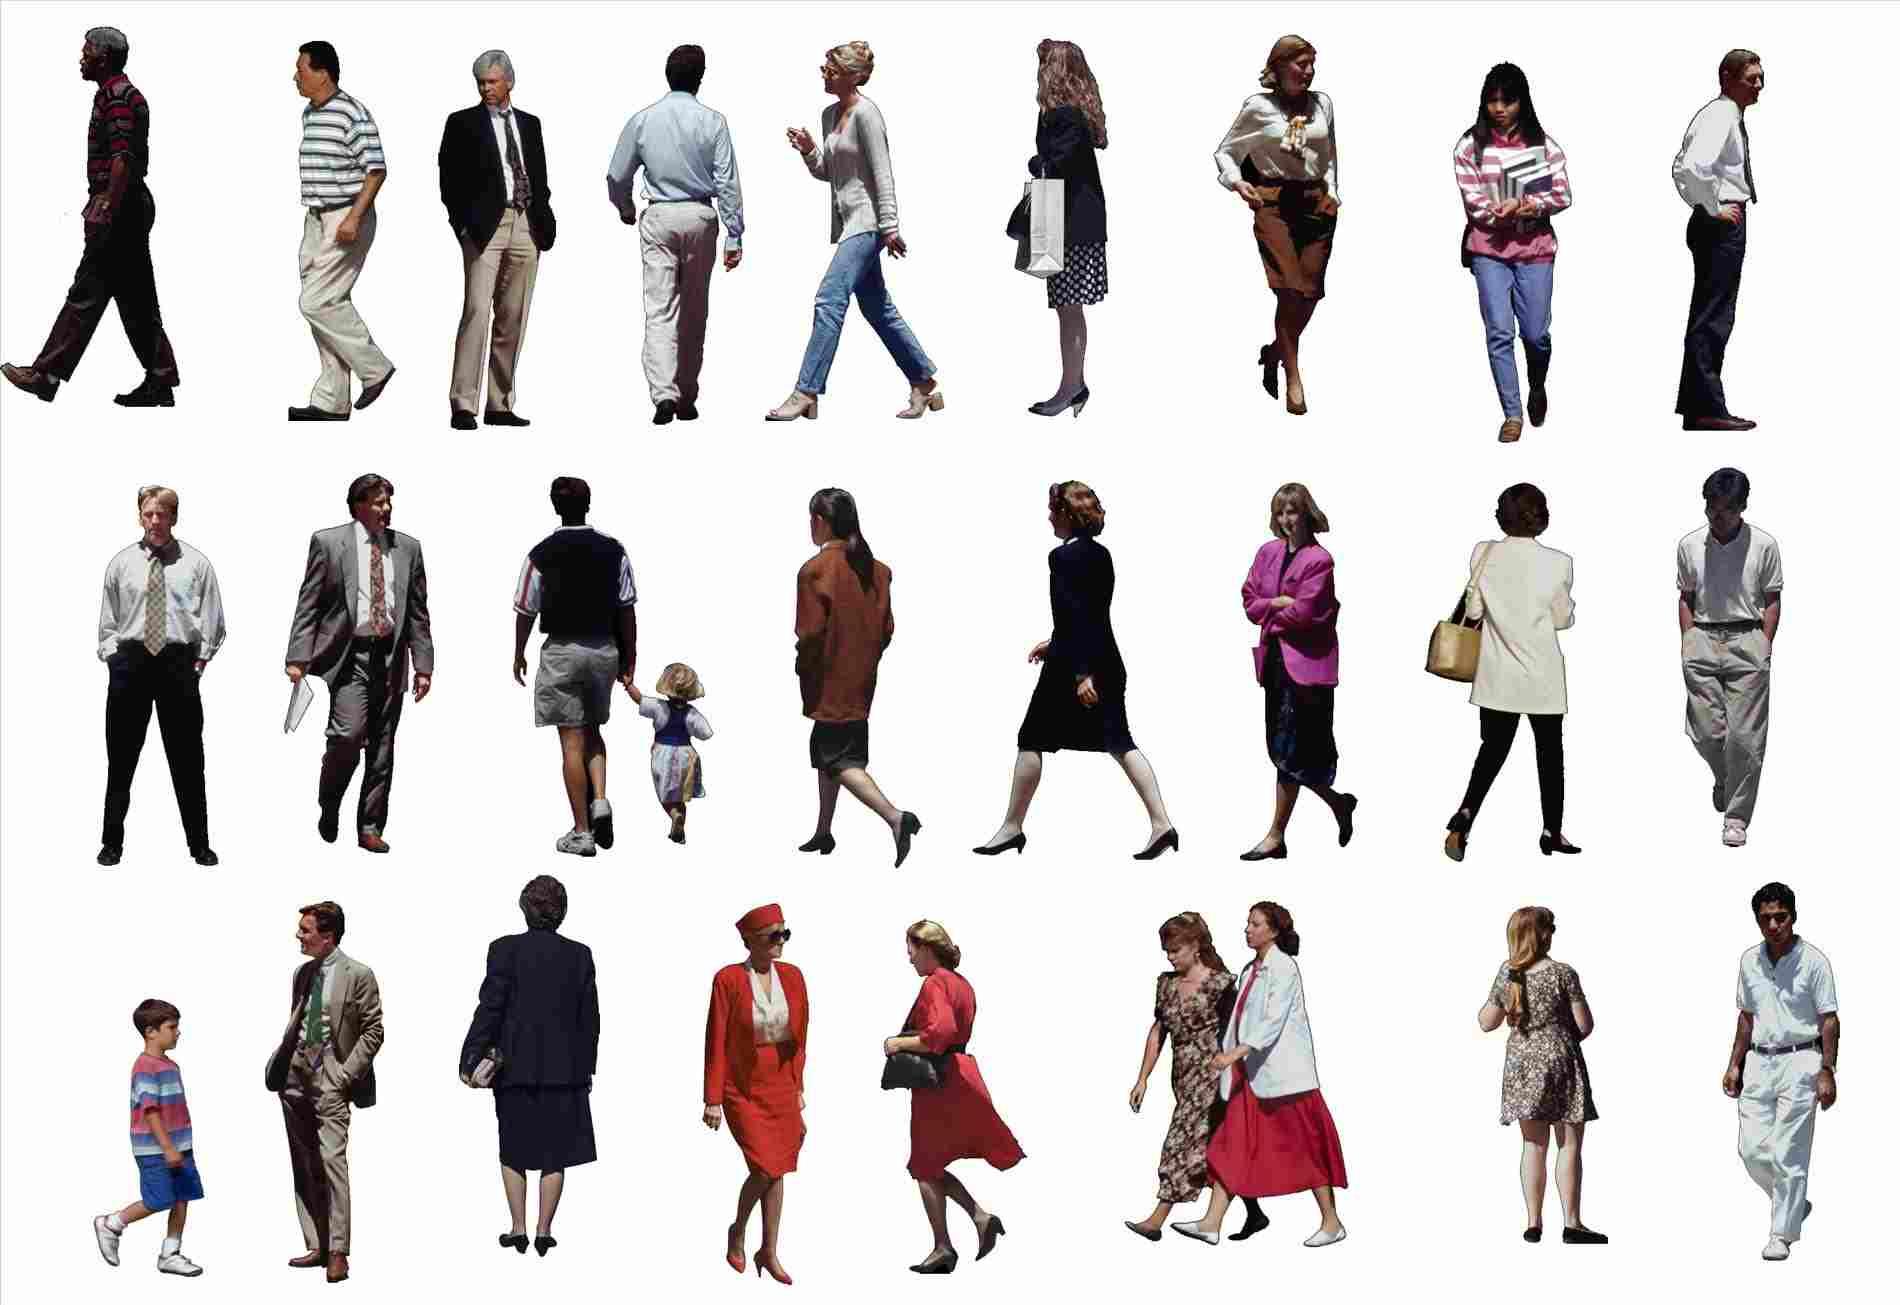 Group People Walking Png (+).